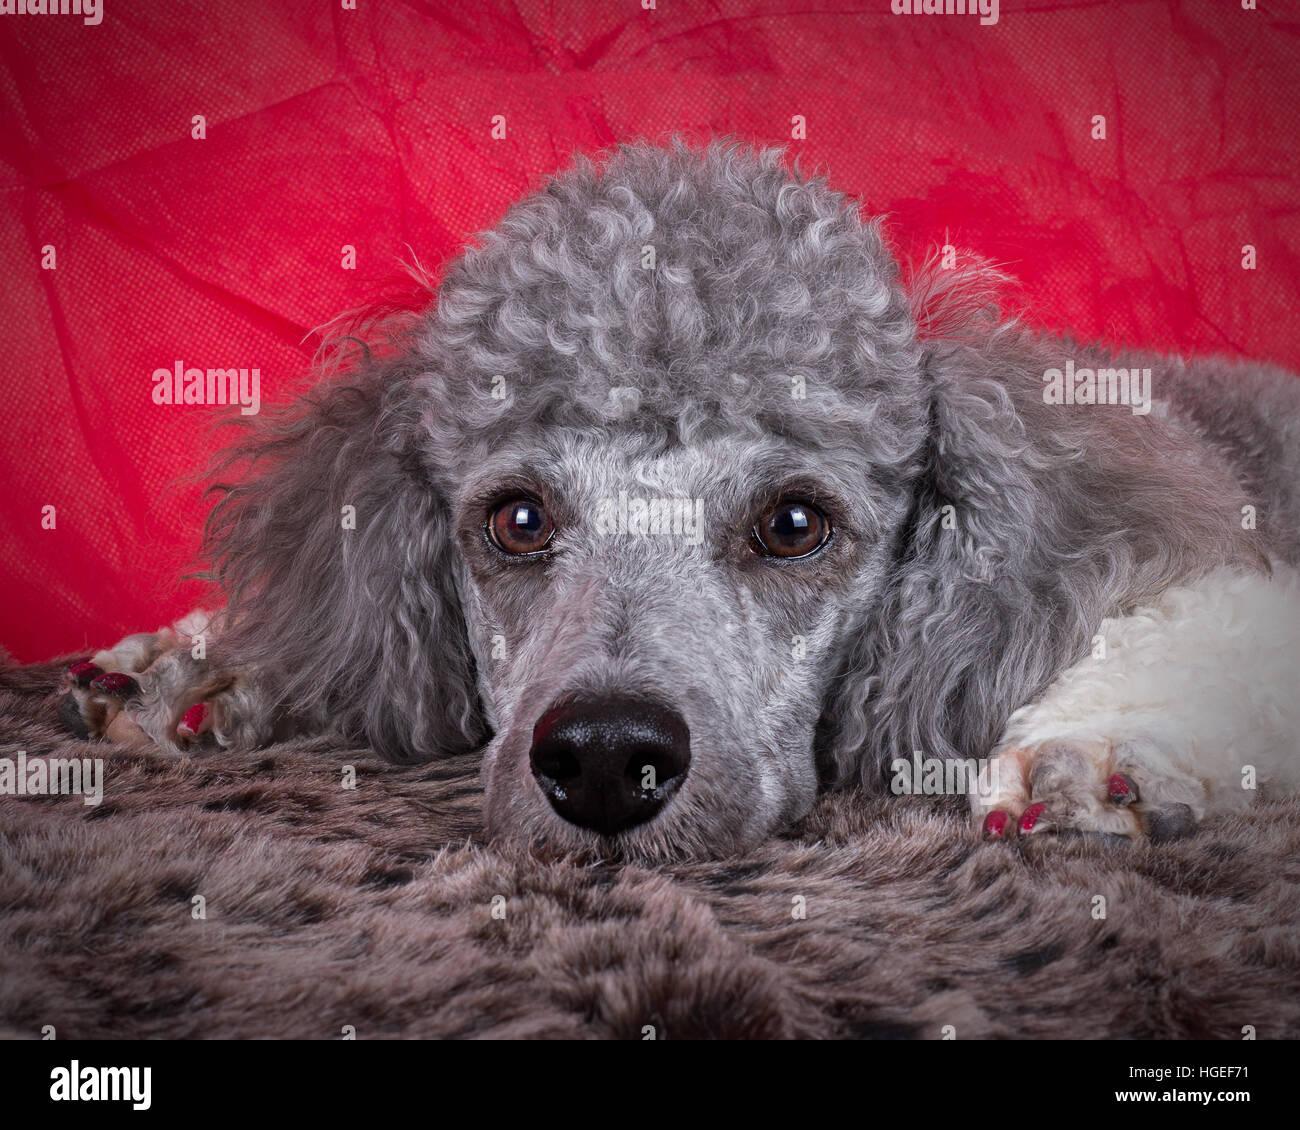 portrait of a poodle puppy - Stock Image